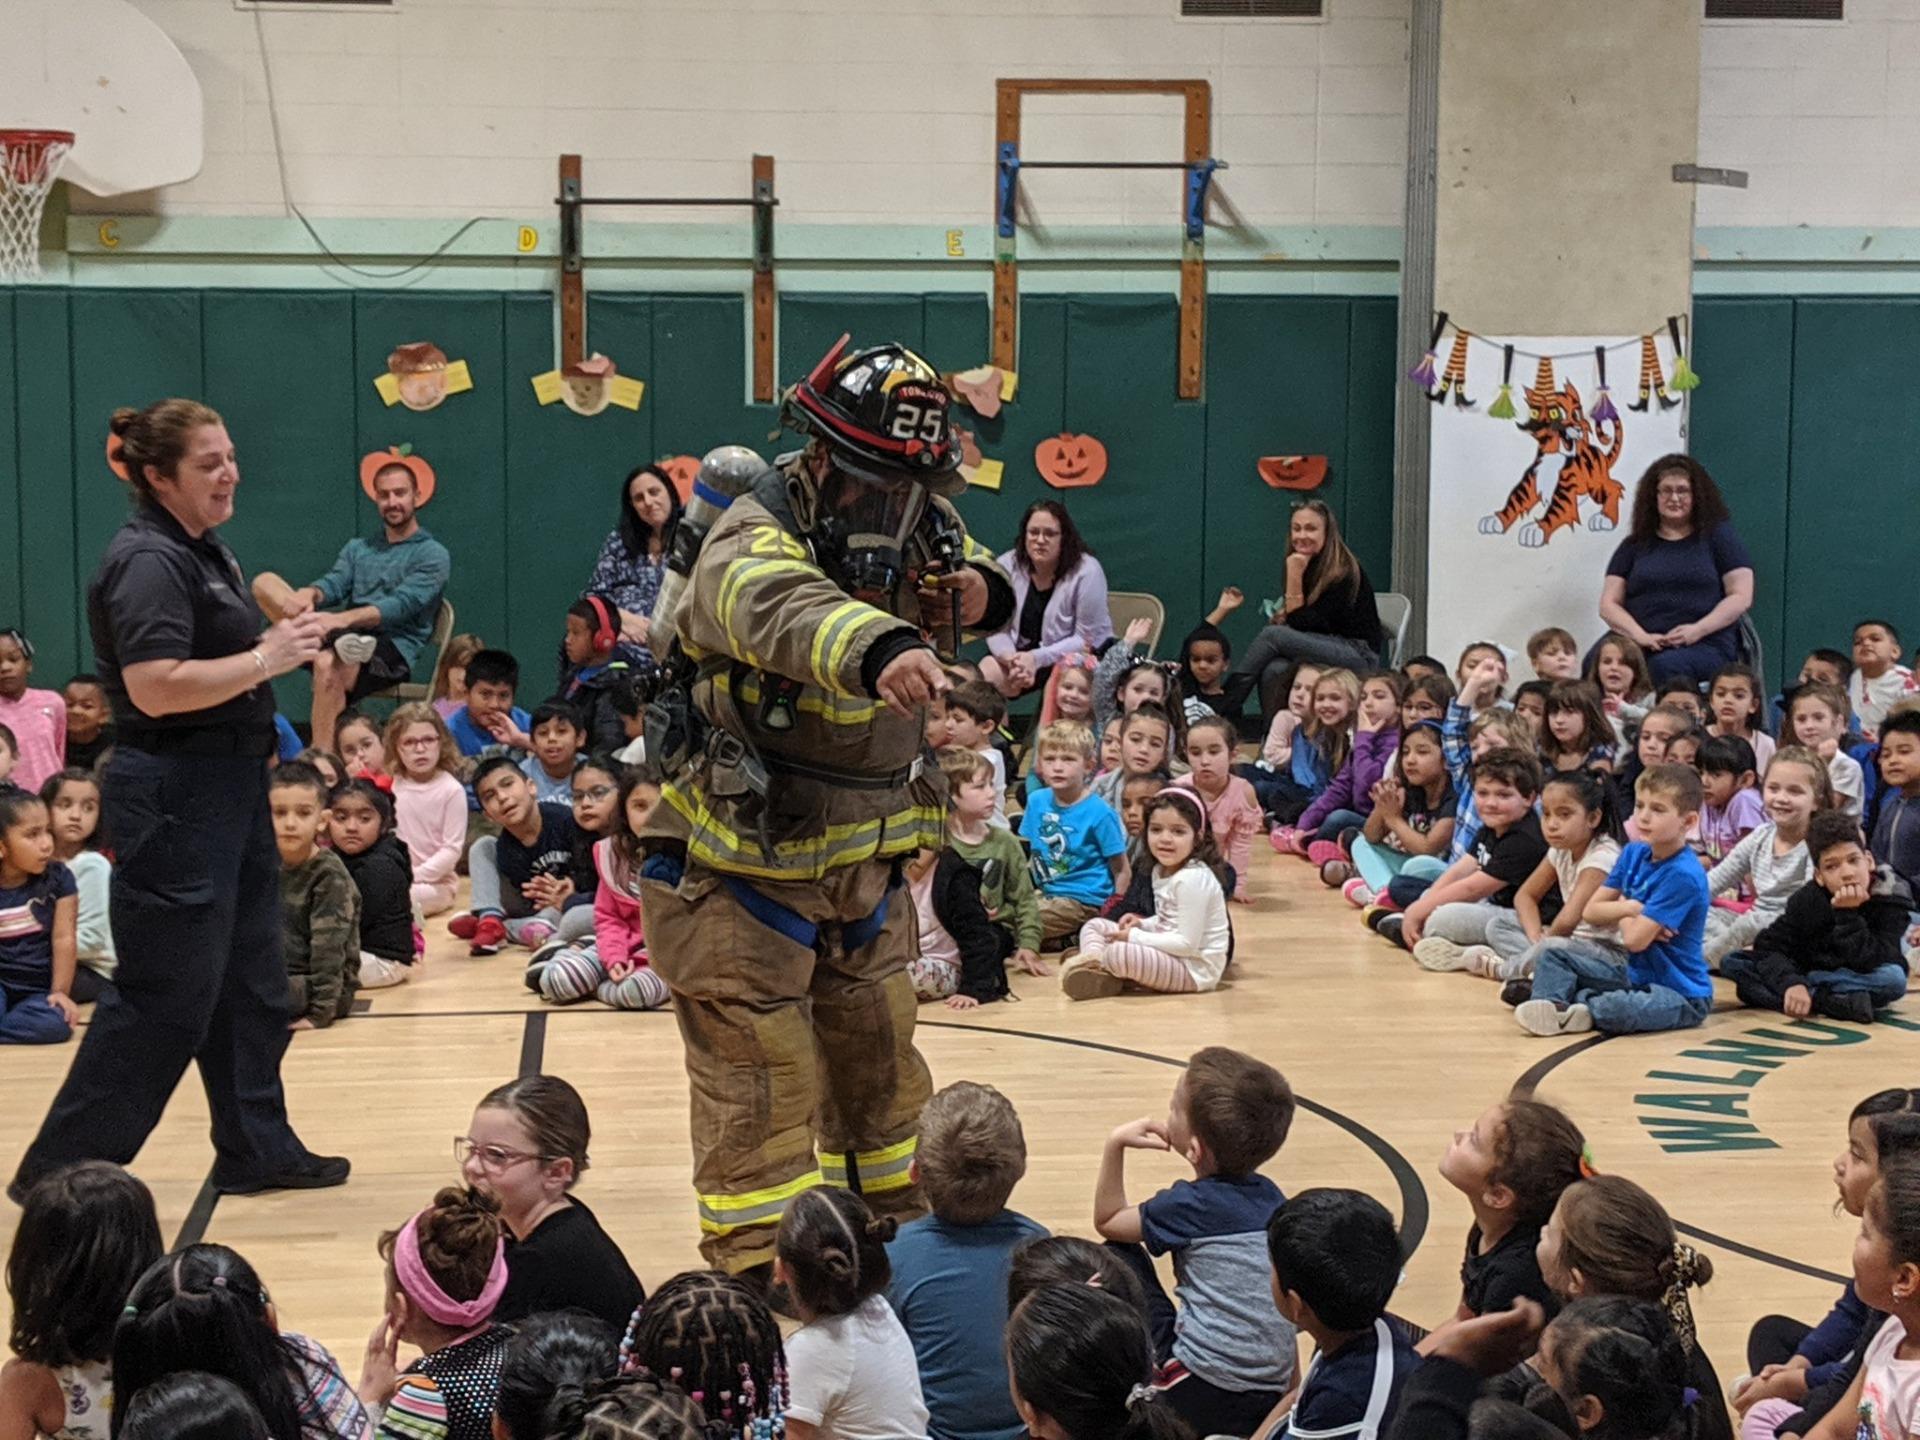 Uniformed Fireman